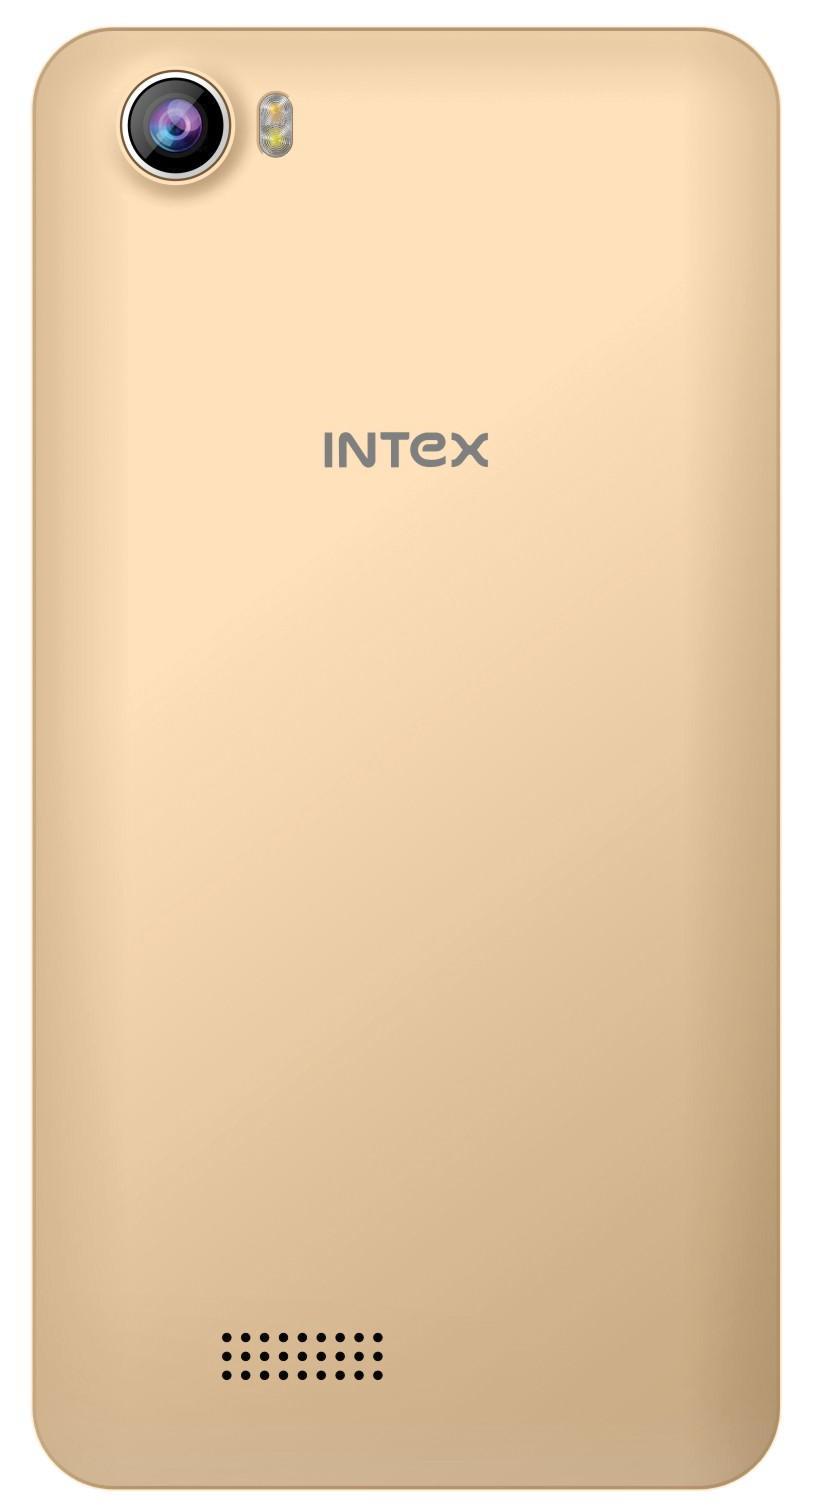 Intex Aqua 4G Strong (Champagne, 8GB)